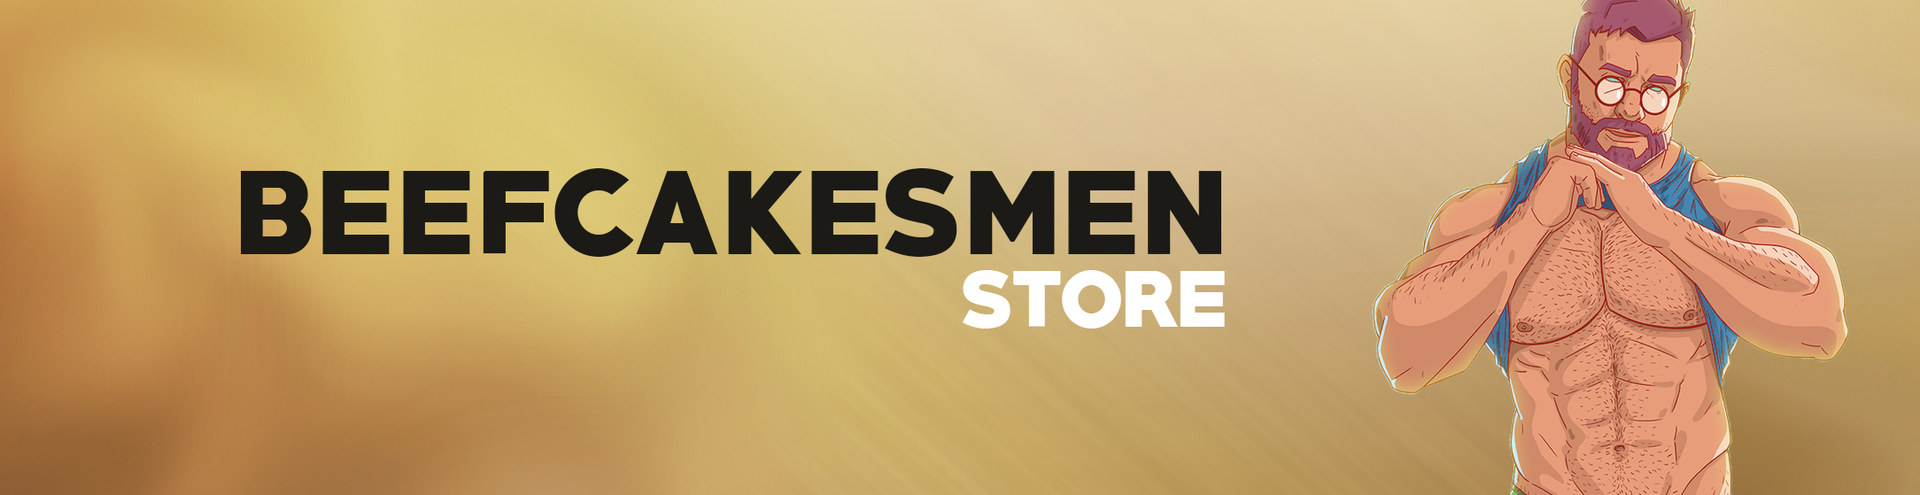 Beefcakesmen Store Store